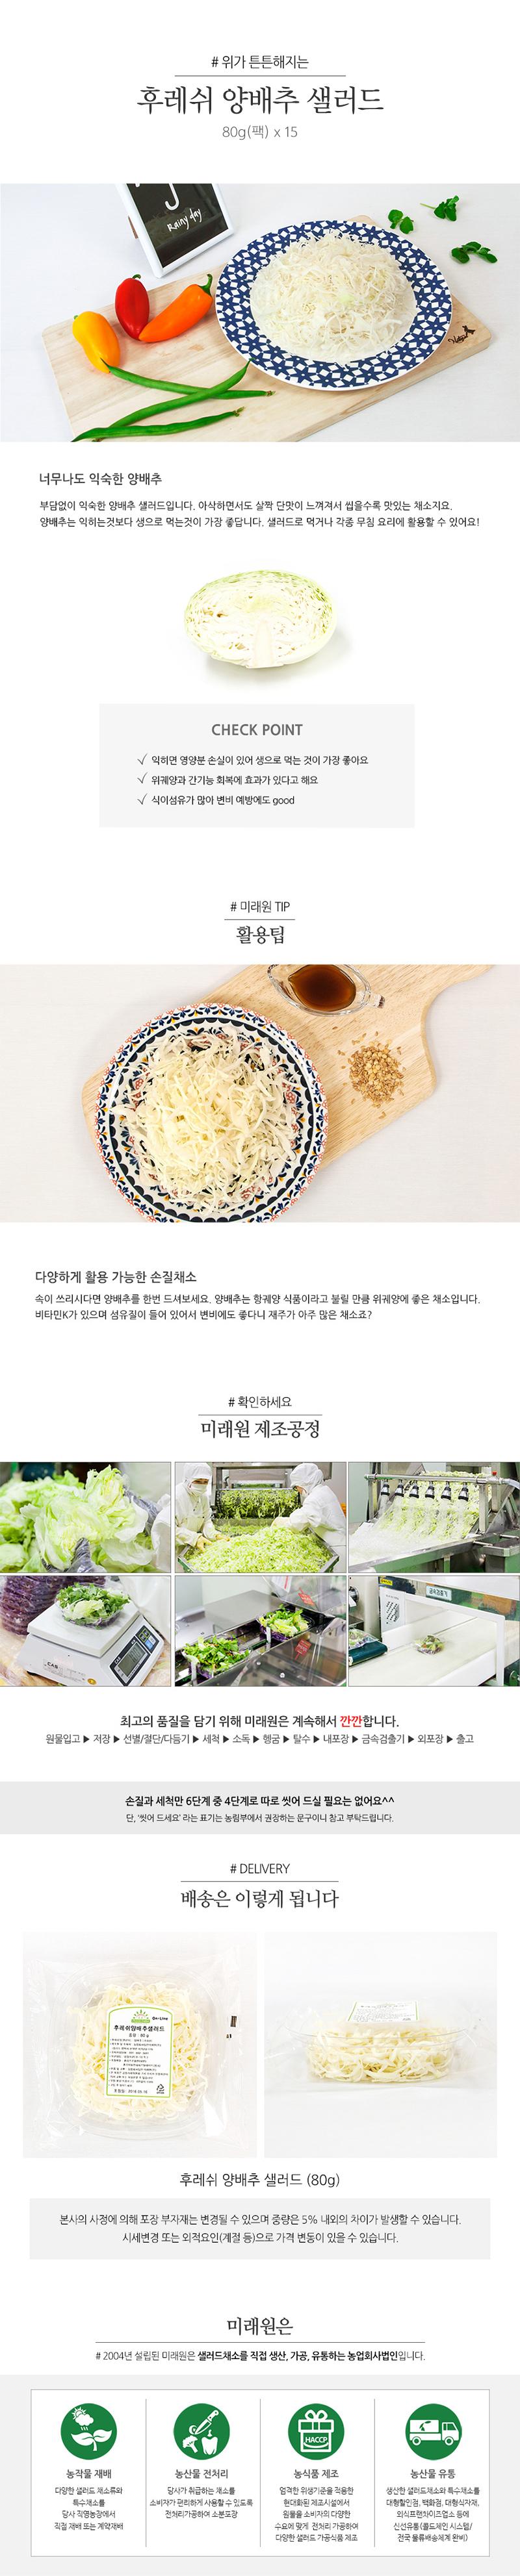 Miraewon_cabbage-salad_80gx15.jpg